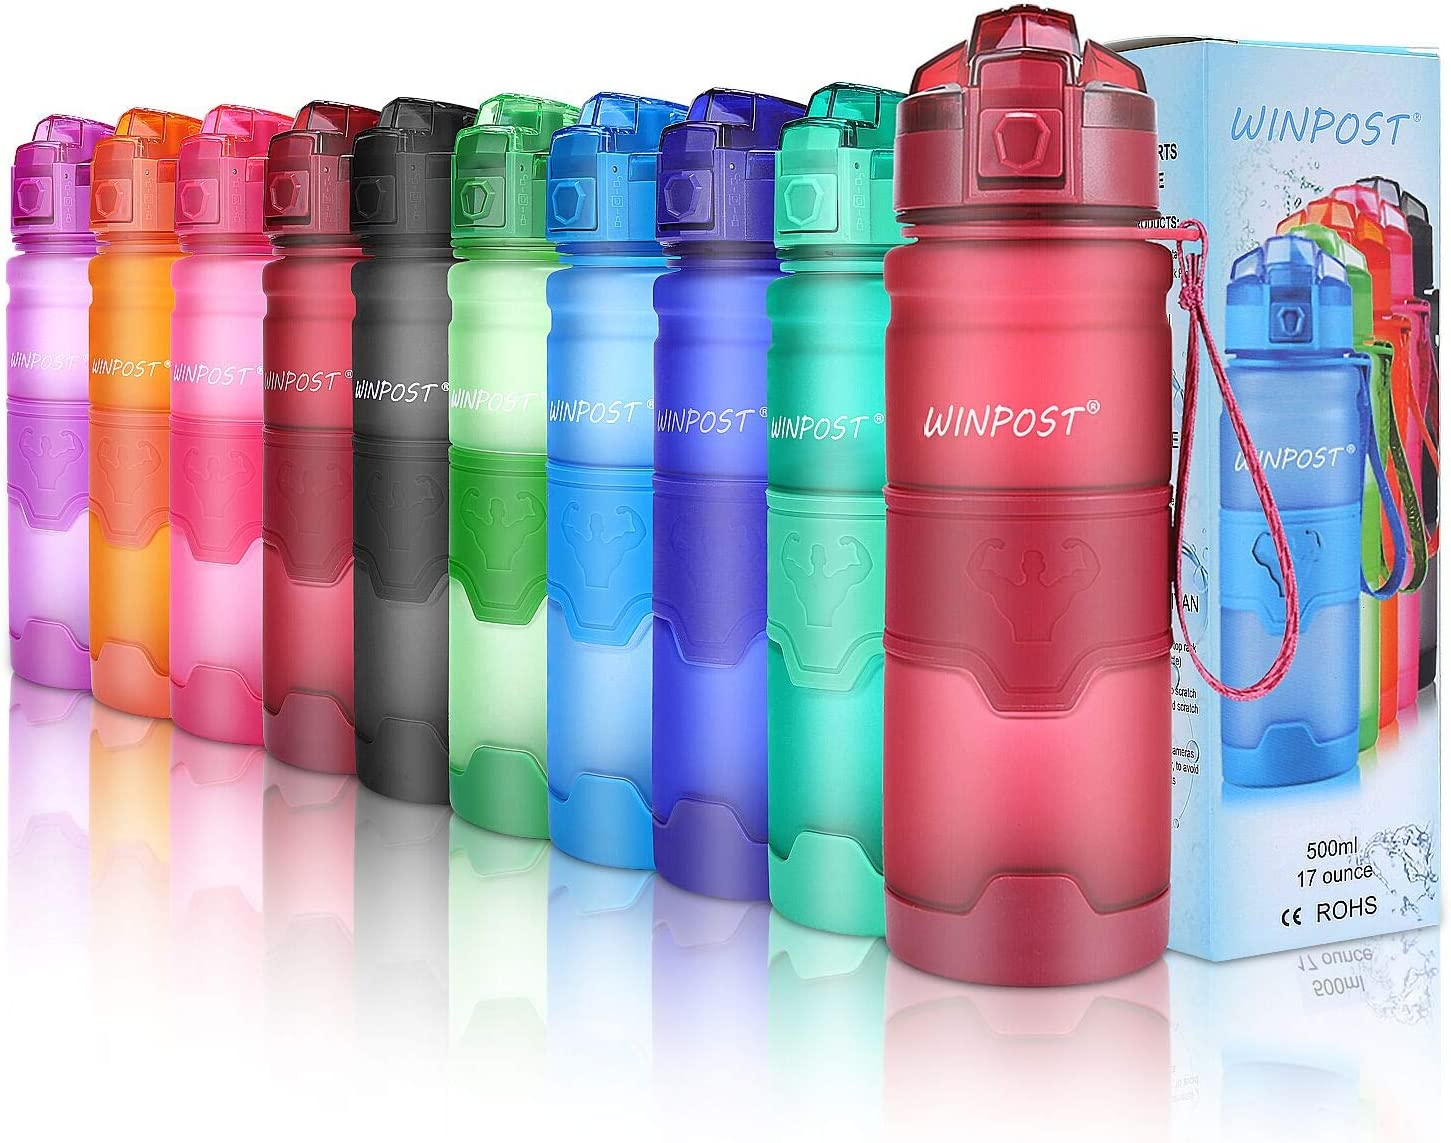 Botella de agua deportiva, 500ml & 700ml y 1000ml-BPA Botella ecológica de plástico Tritan con filtro, tapa abatible, se abre con 1 clic, reutilizable con tapa a prueba de fugas para acampar, corr